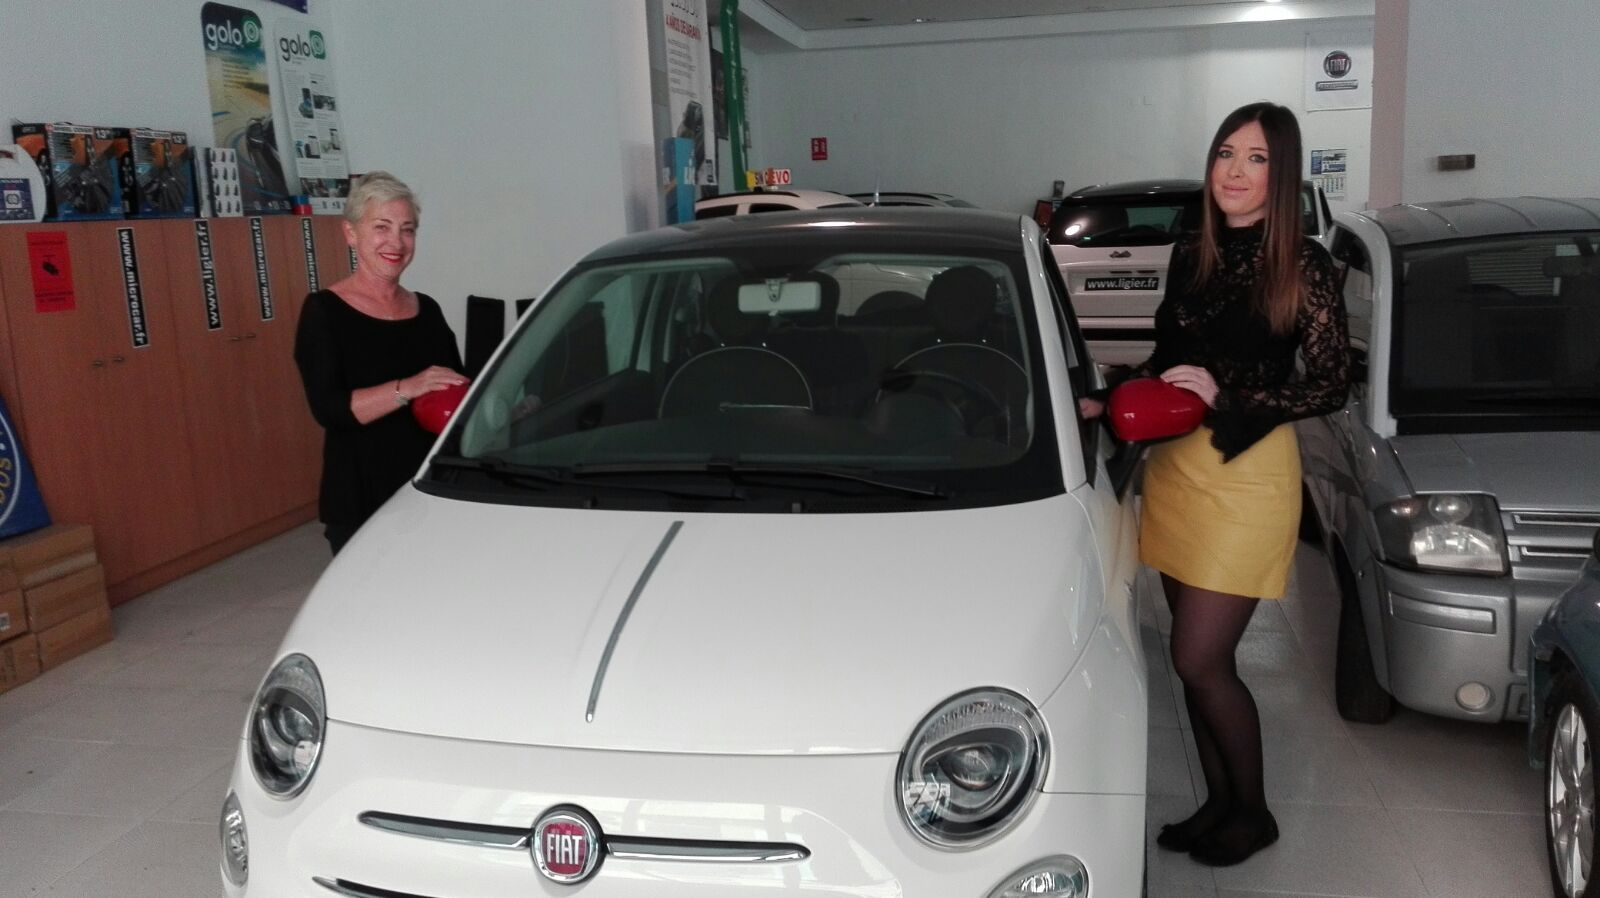 Entrega a Pilar y Marta de un Fiat 500 Lounge